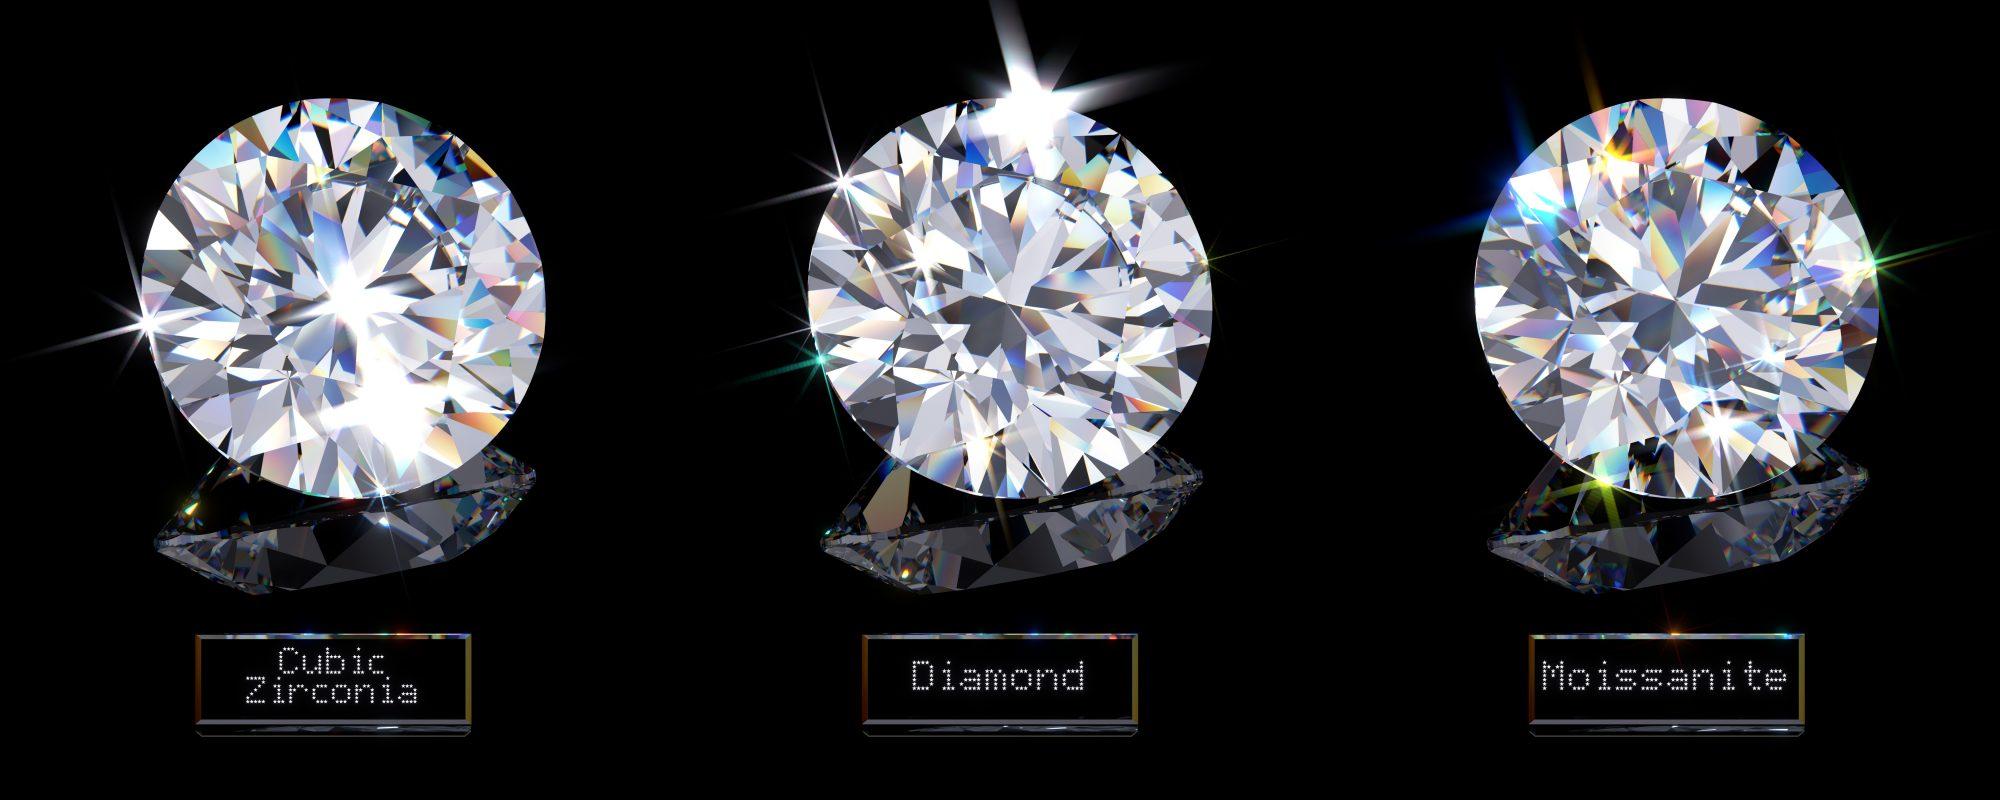 diamond engagement ring alternative